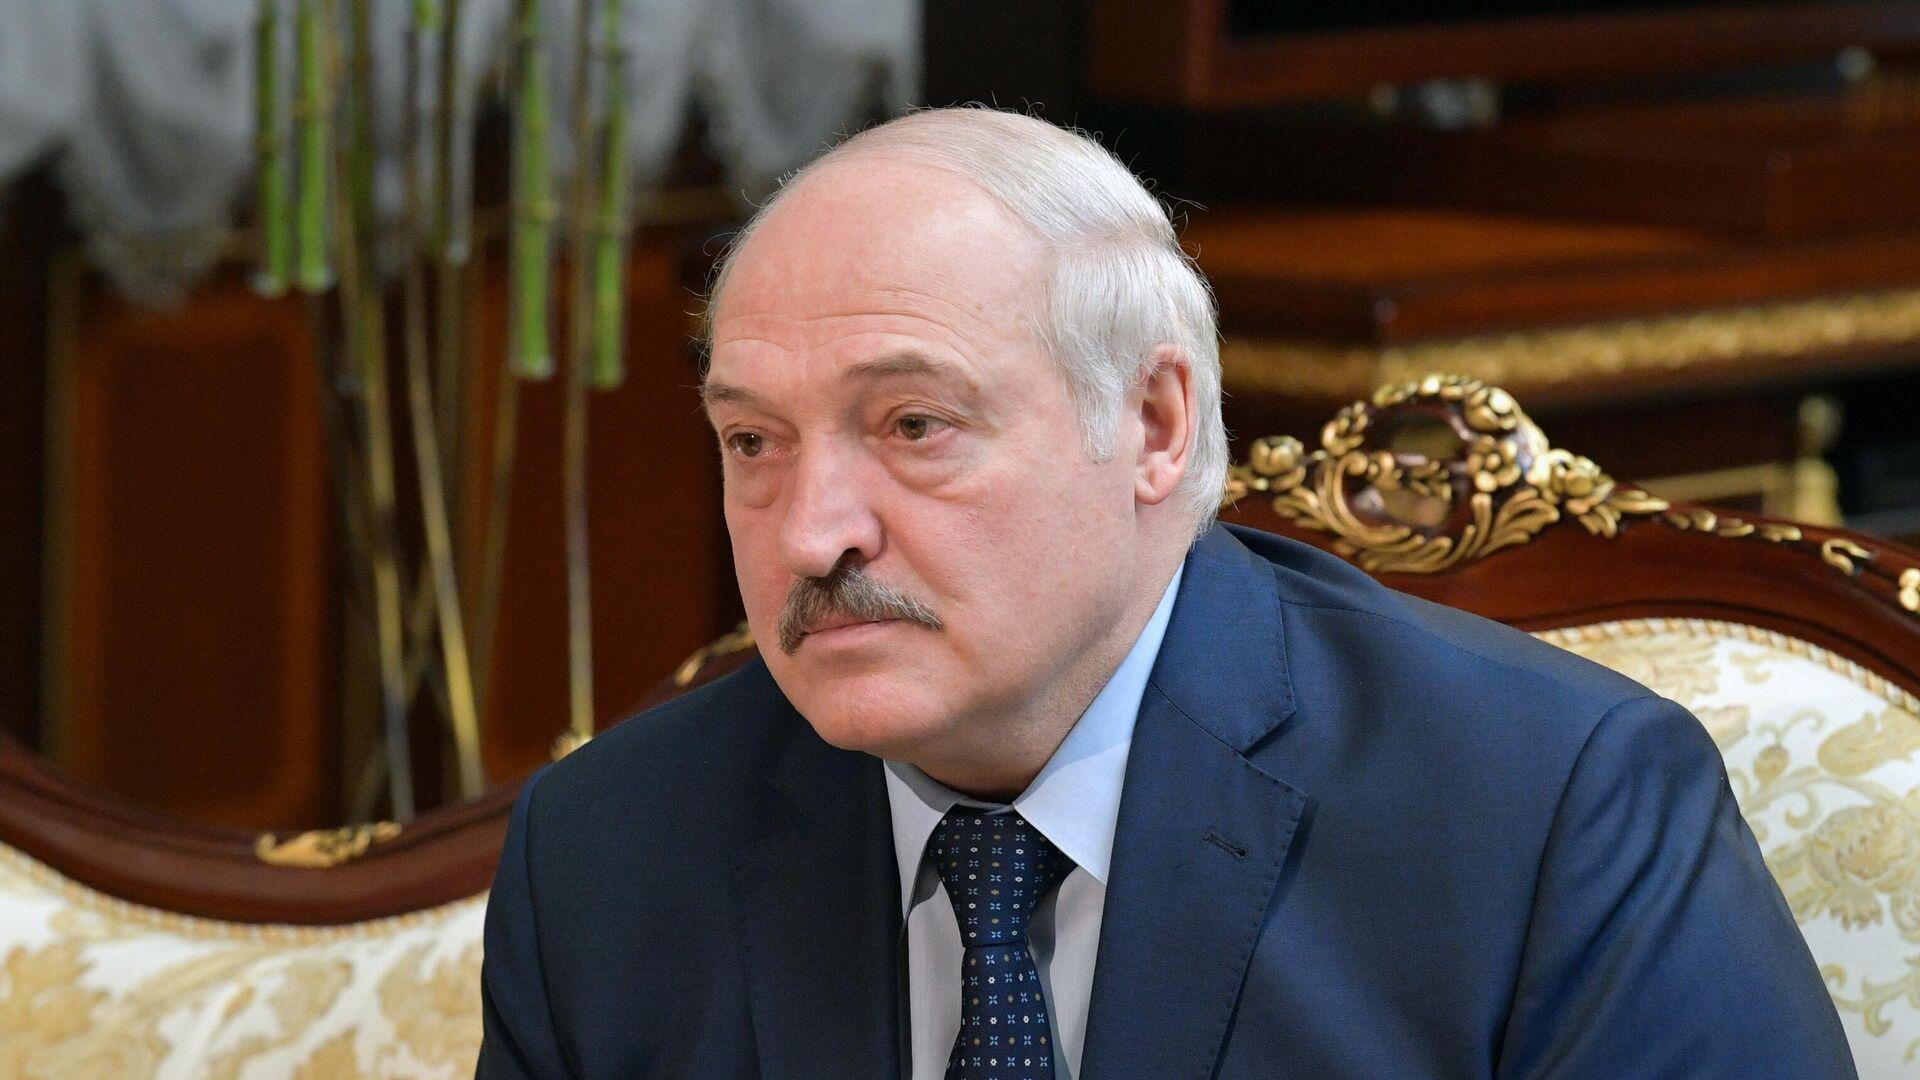 Президент Белоруссии Александр Лукашенко - Sputnik Ўзбекистон, 1920, 09.08.2021